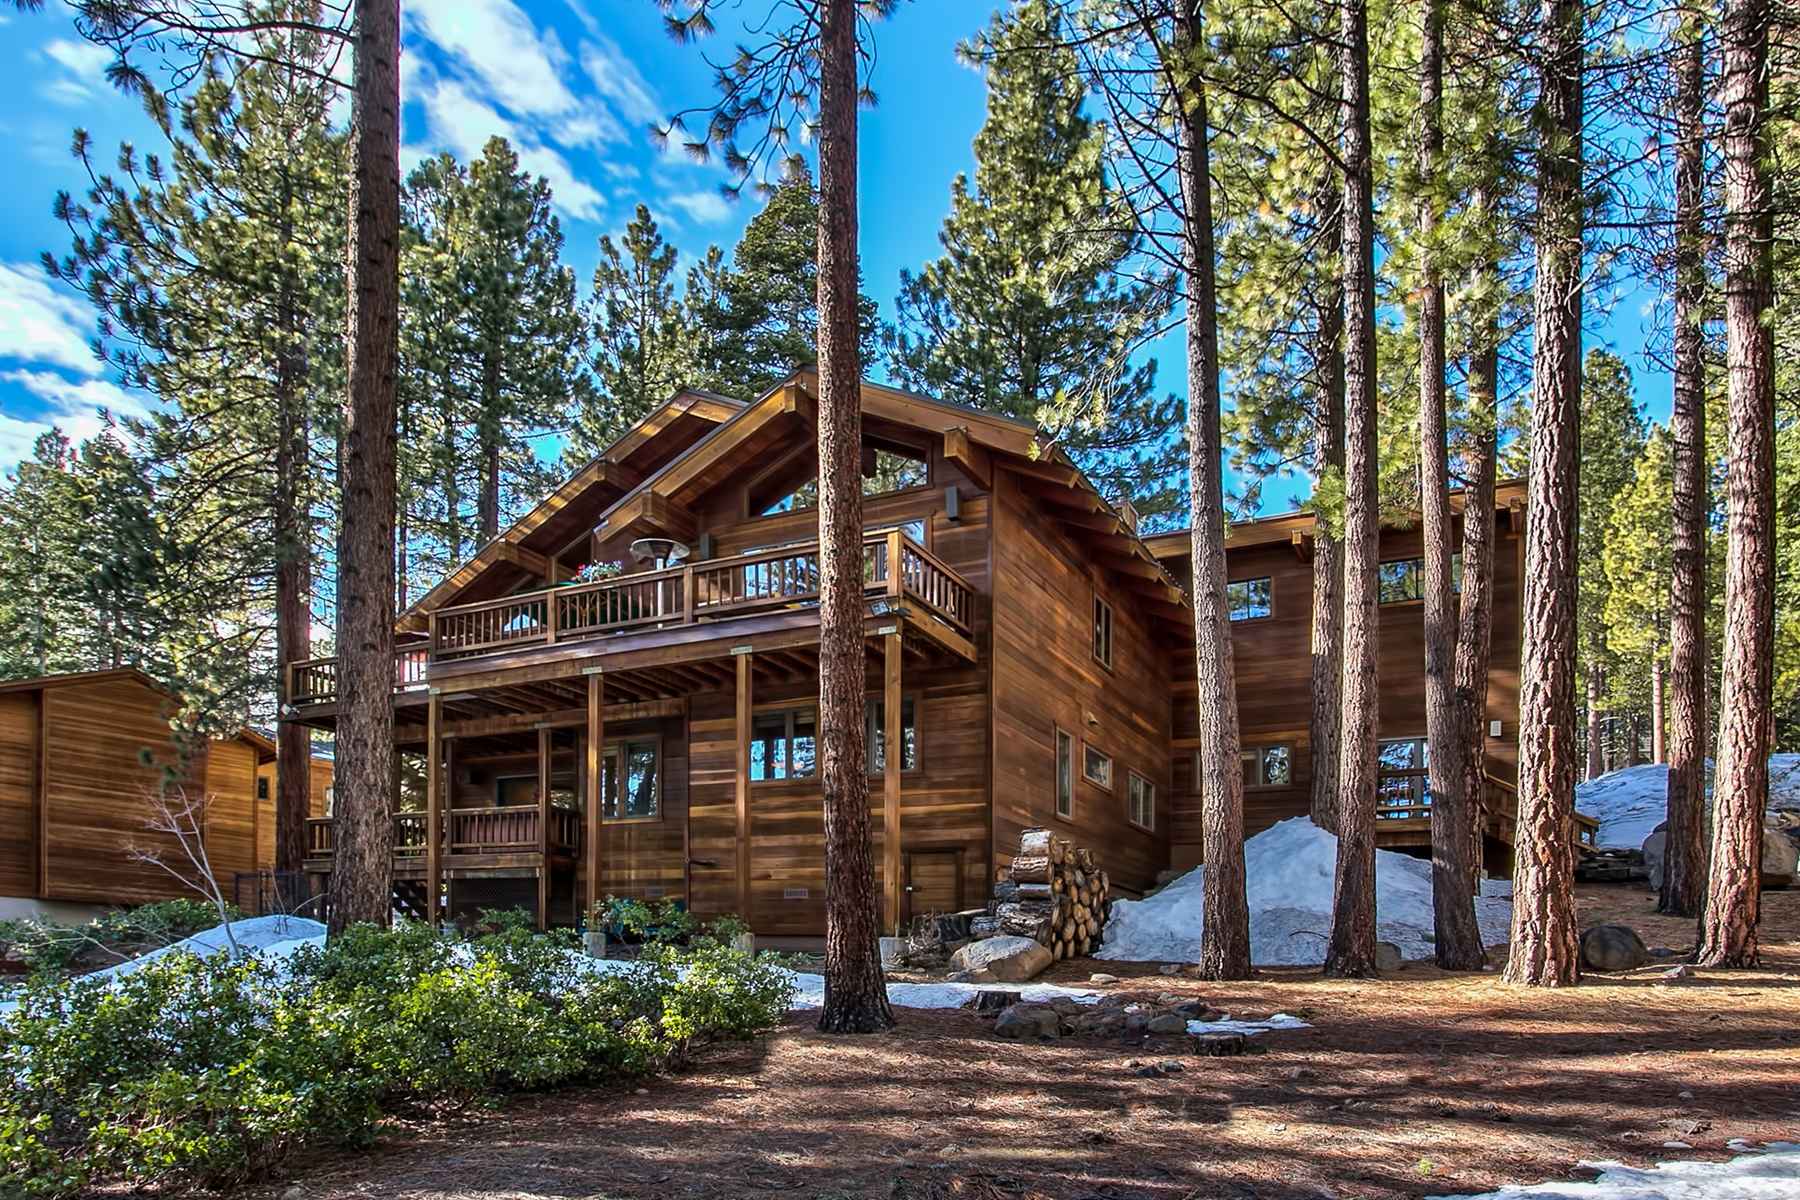 独户住宅 为 销售 在 800 Tyner Way Incline Village, 内华达州, 89451 Lake Tahoe, 美国